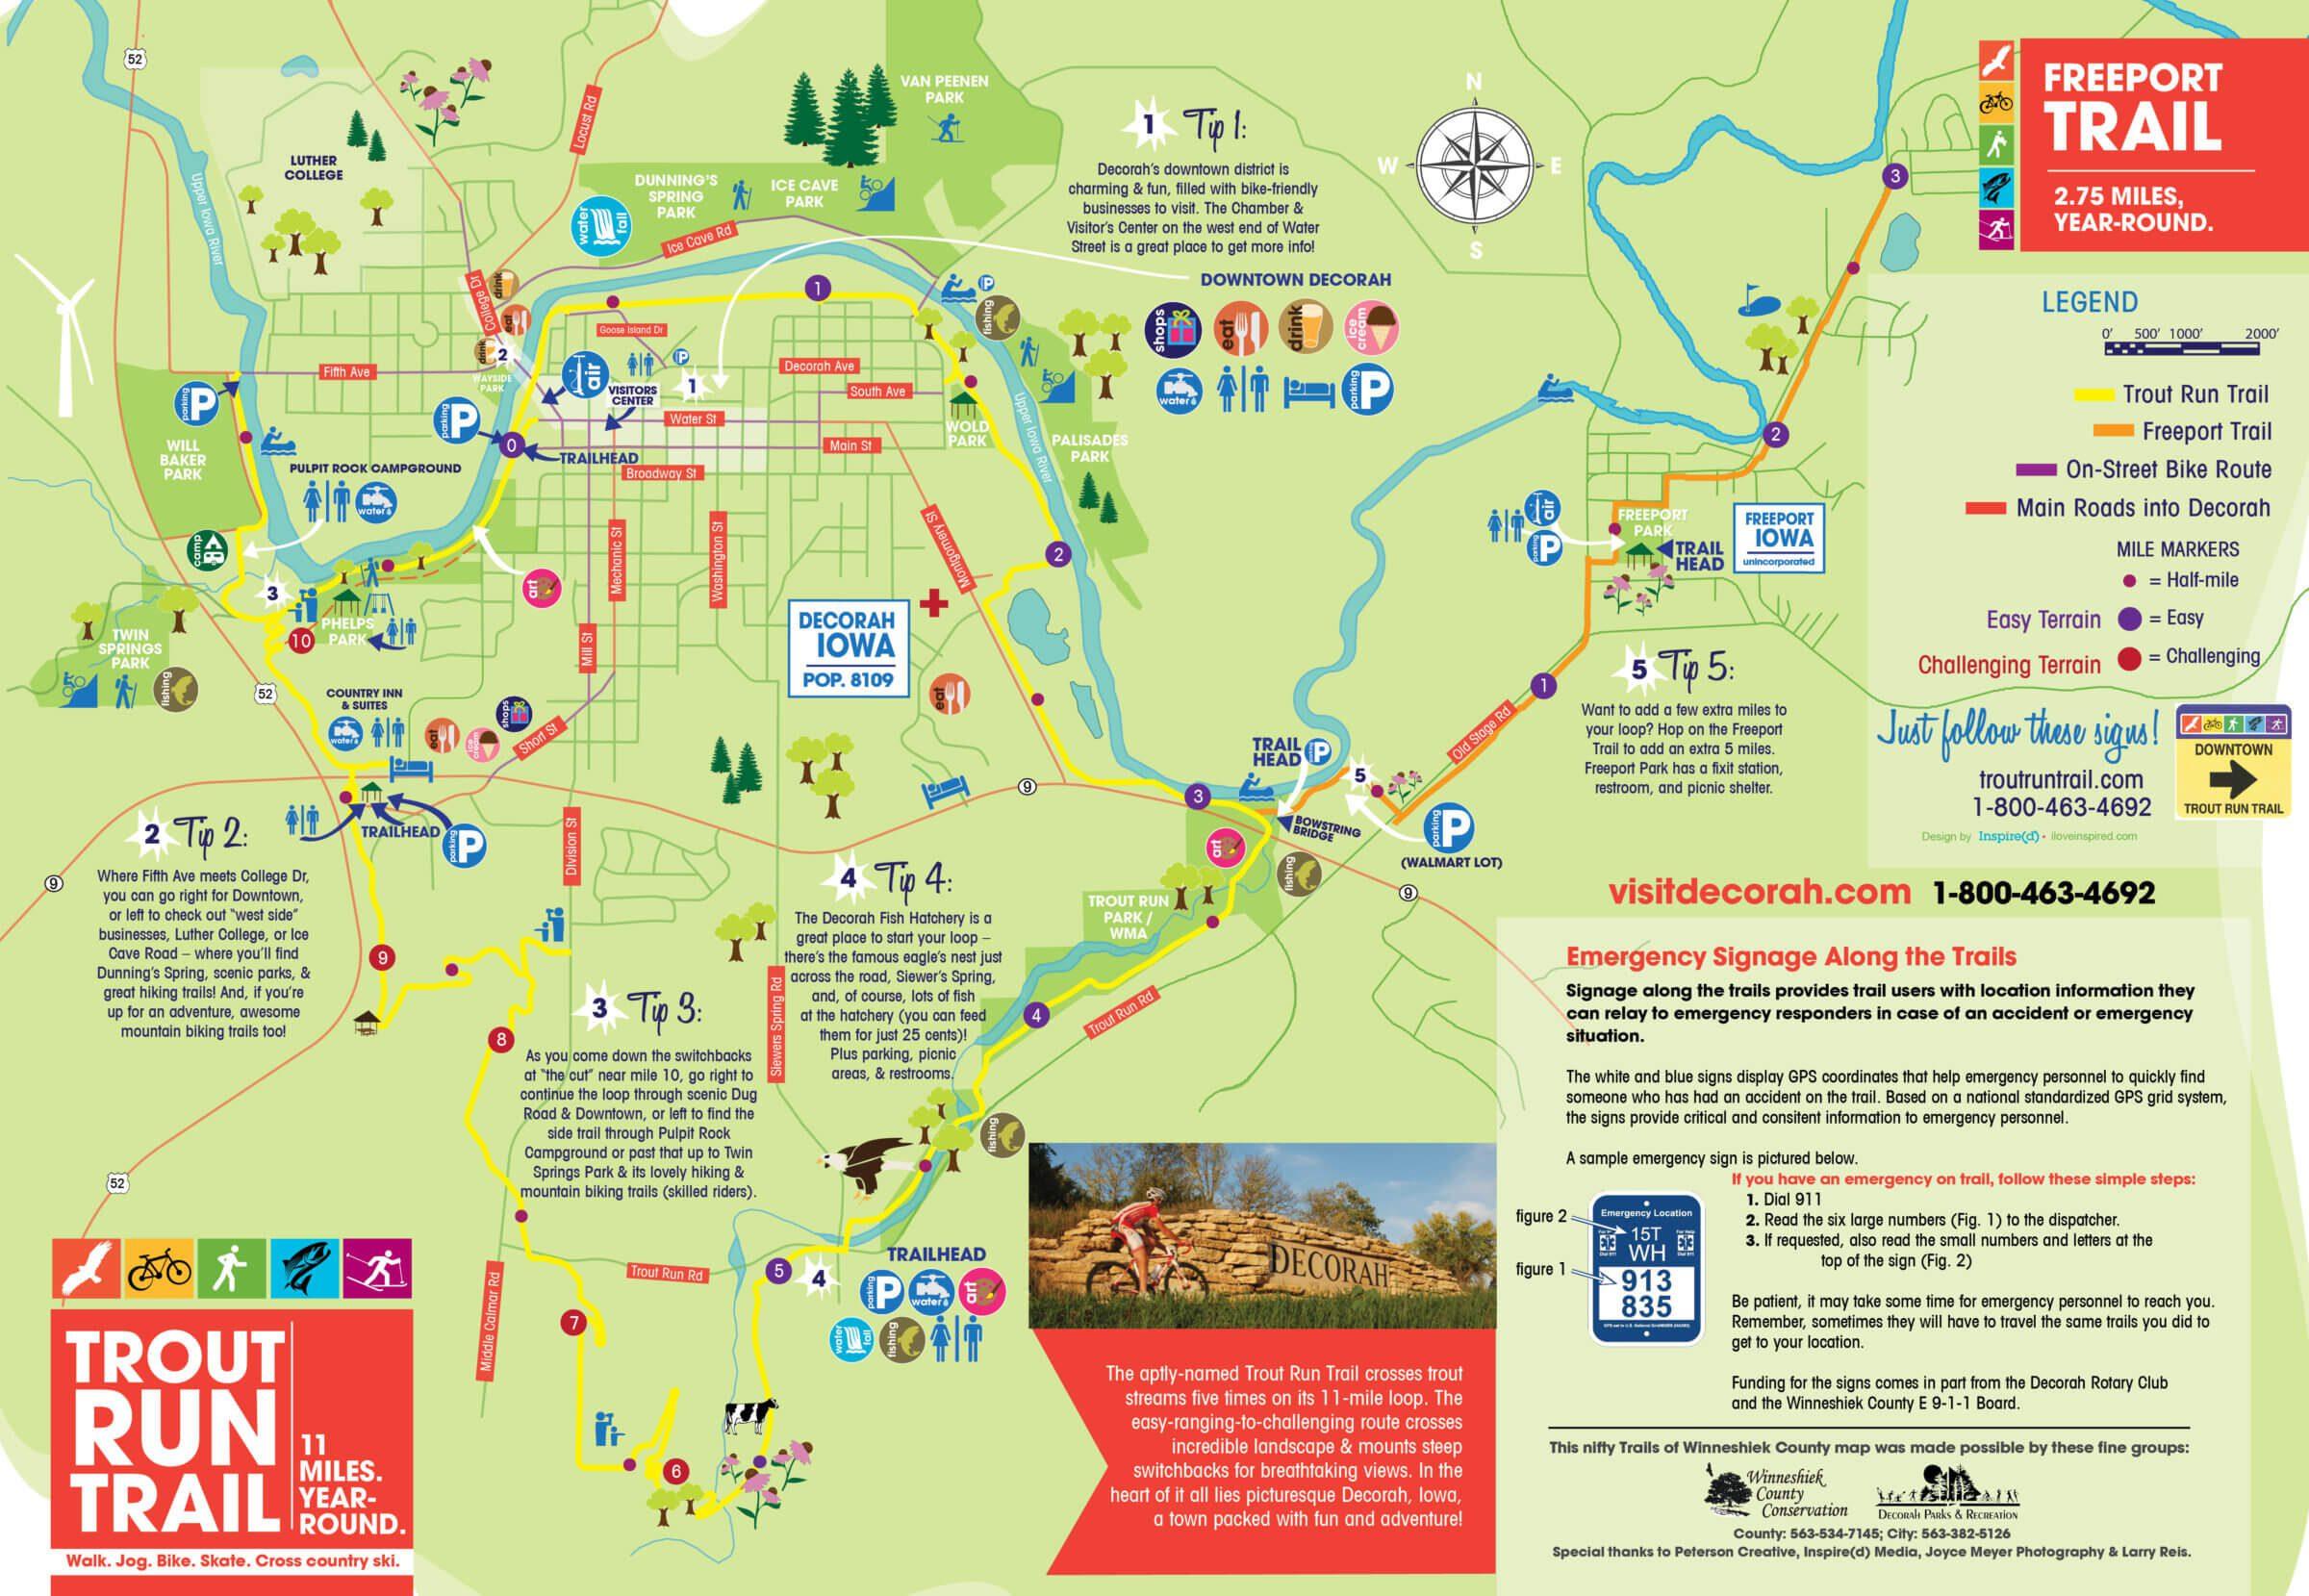 Trail Maps Decorah Park Recreation Department - How to map a run